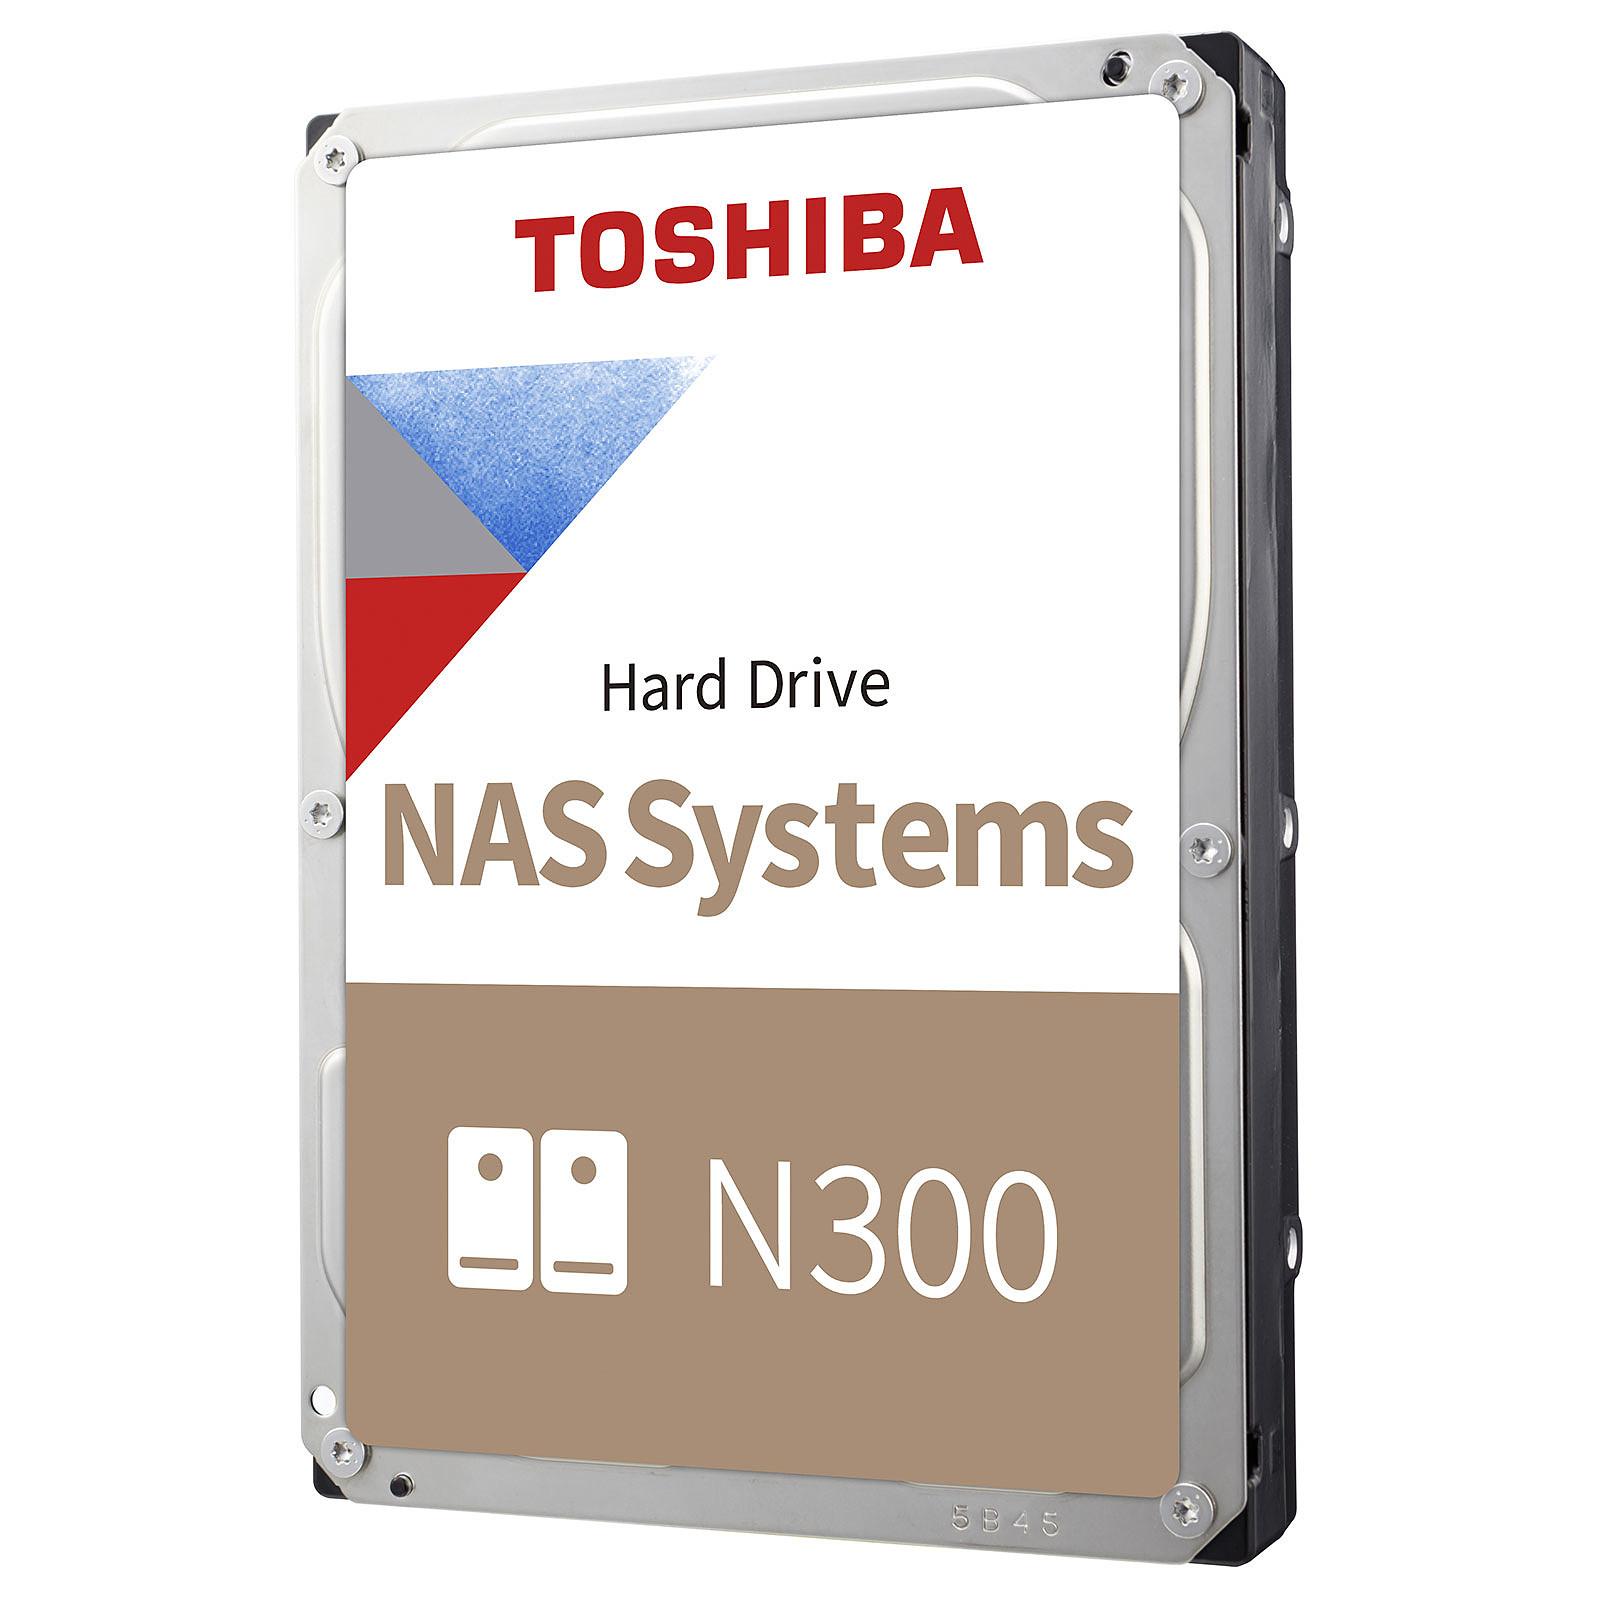 TOSHIBA X300 12 TB